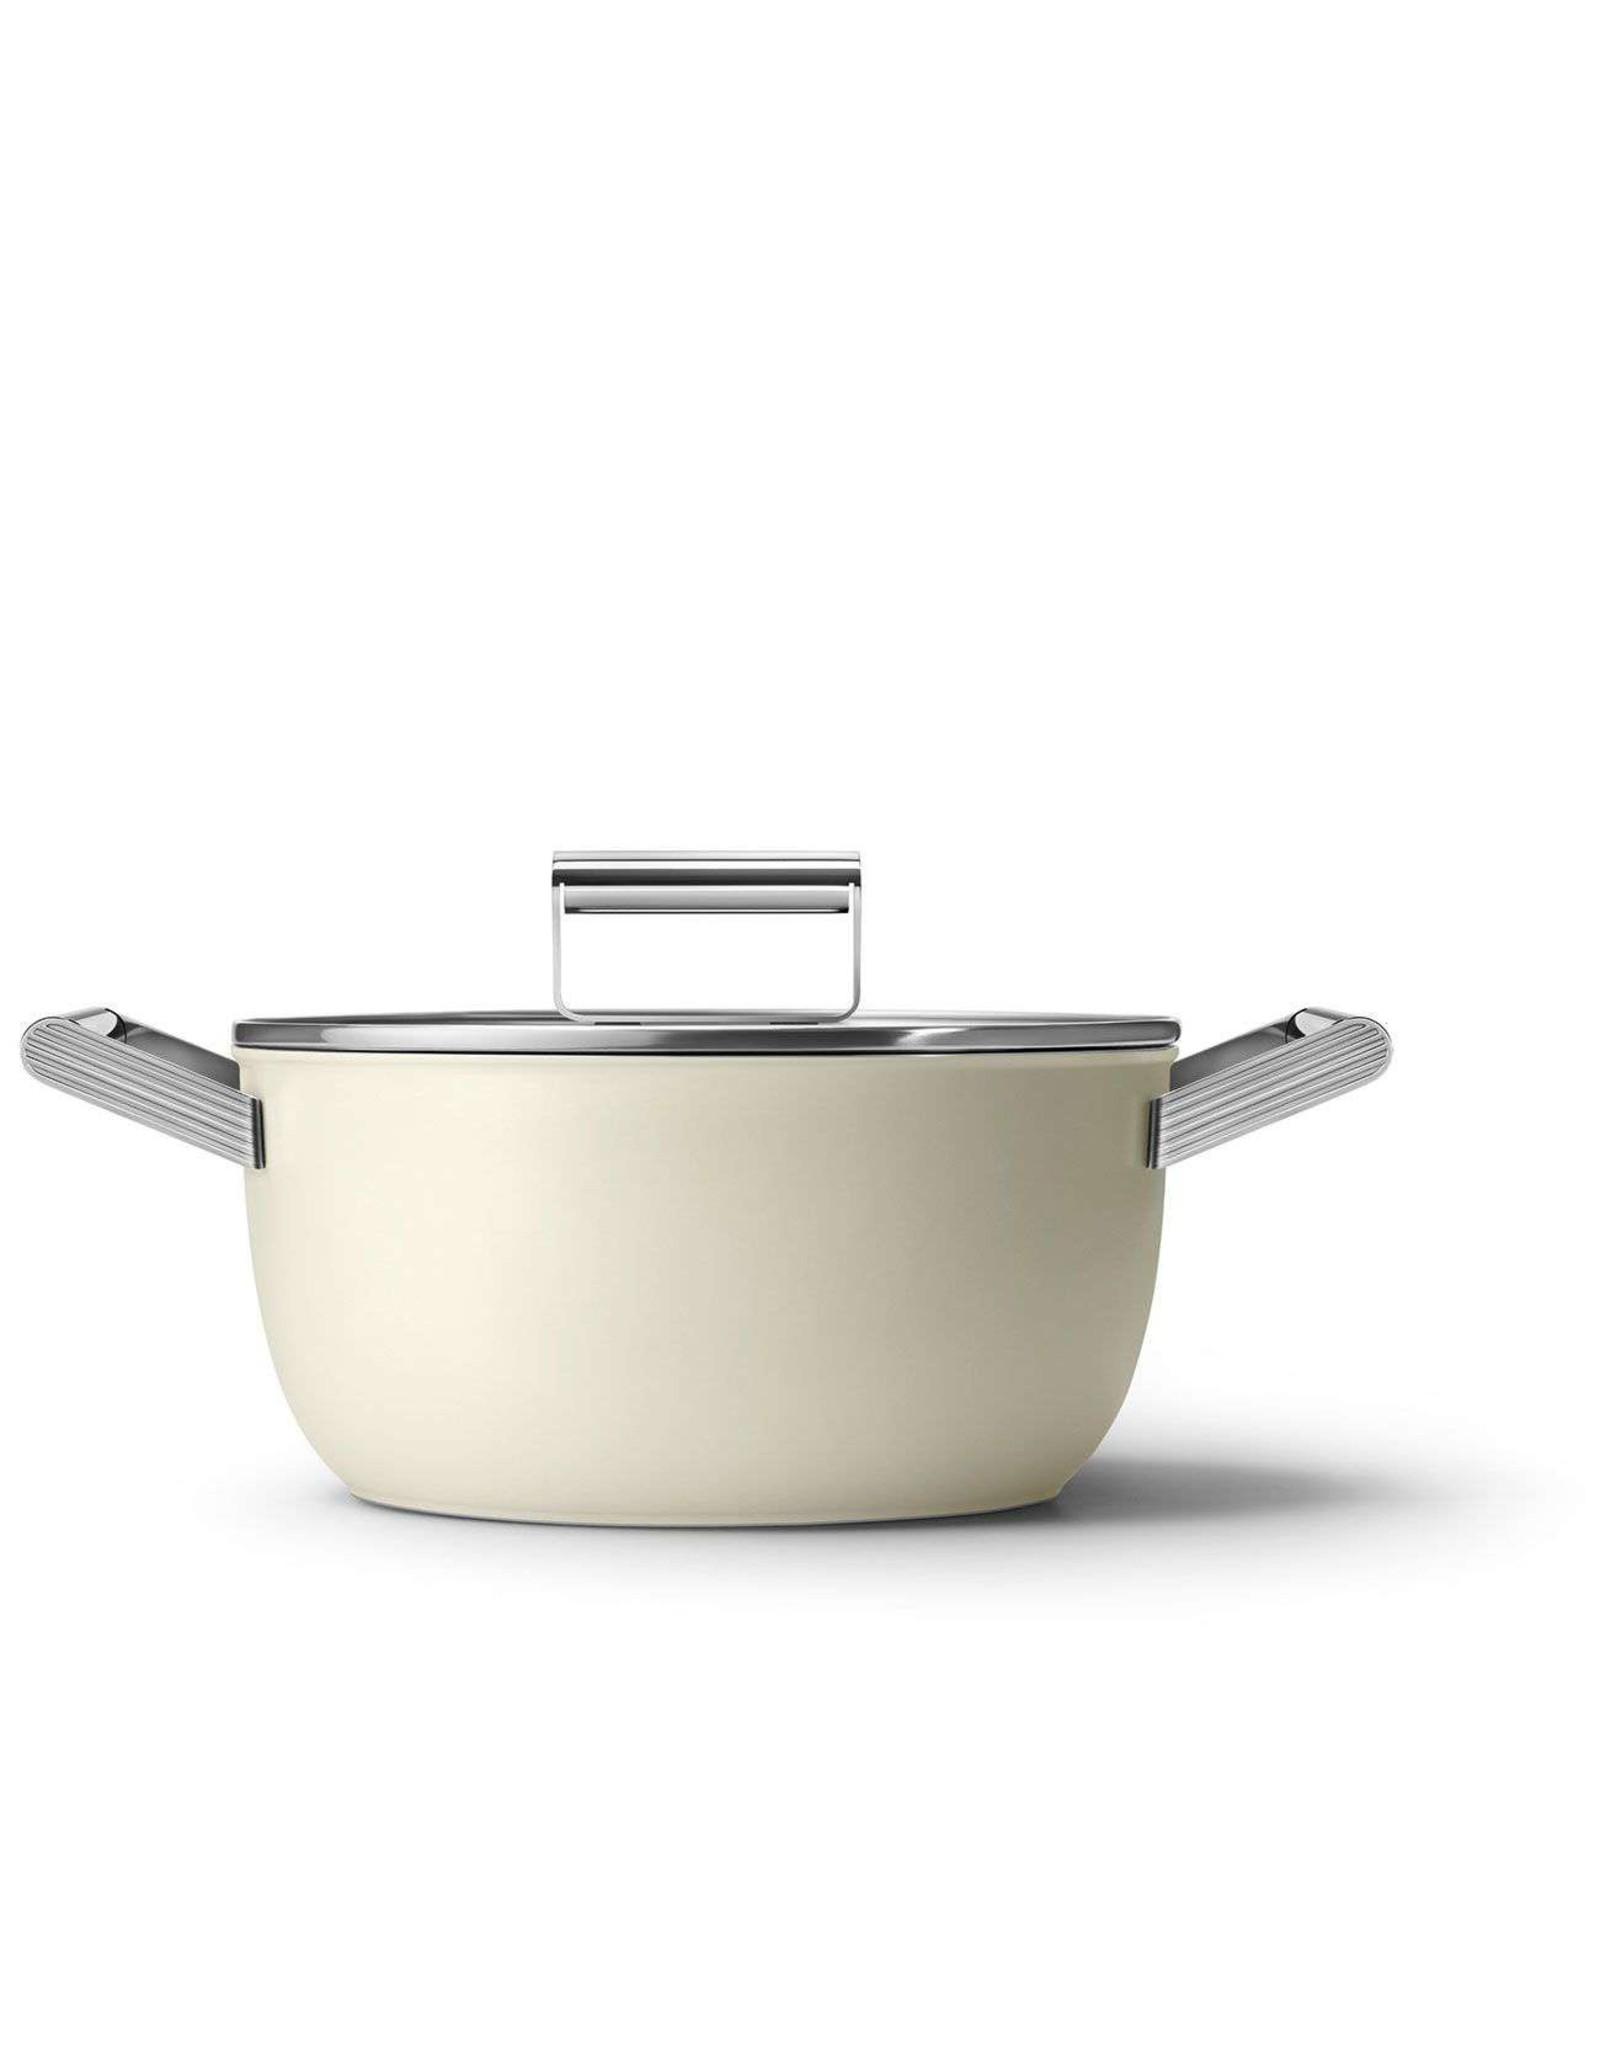 Smeg pannen Smeg. Kookpan. Met Deksel 24 cm Creme.